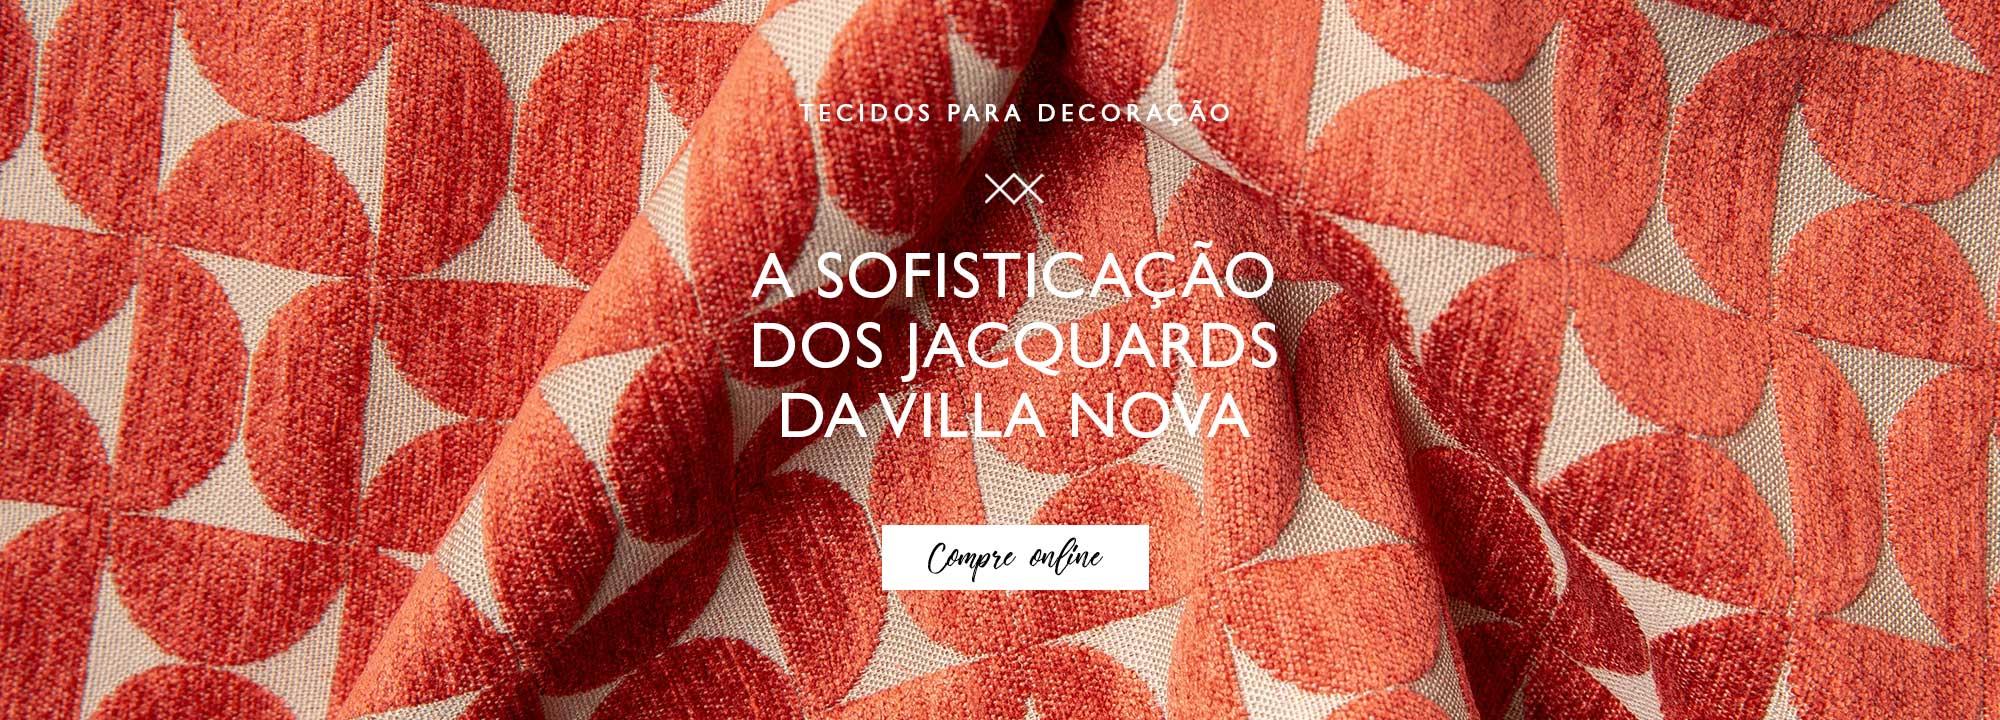 Template_02-Villa-Nova-Tecidos-Jacquards-tecidos-para-decoracao-metro